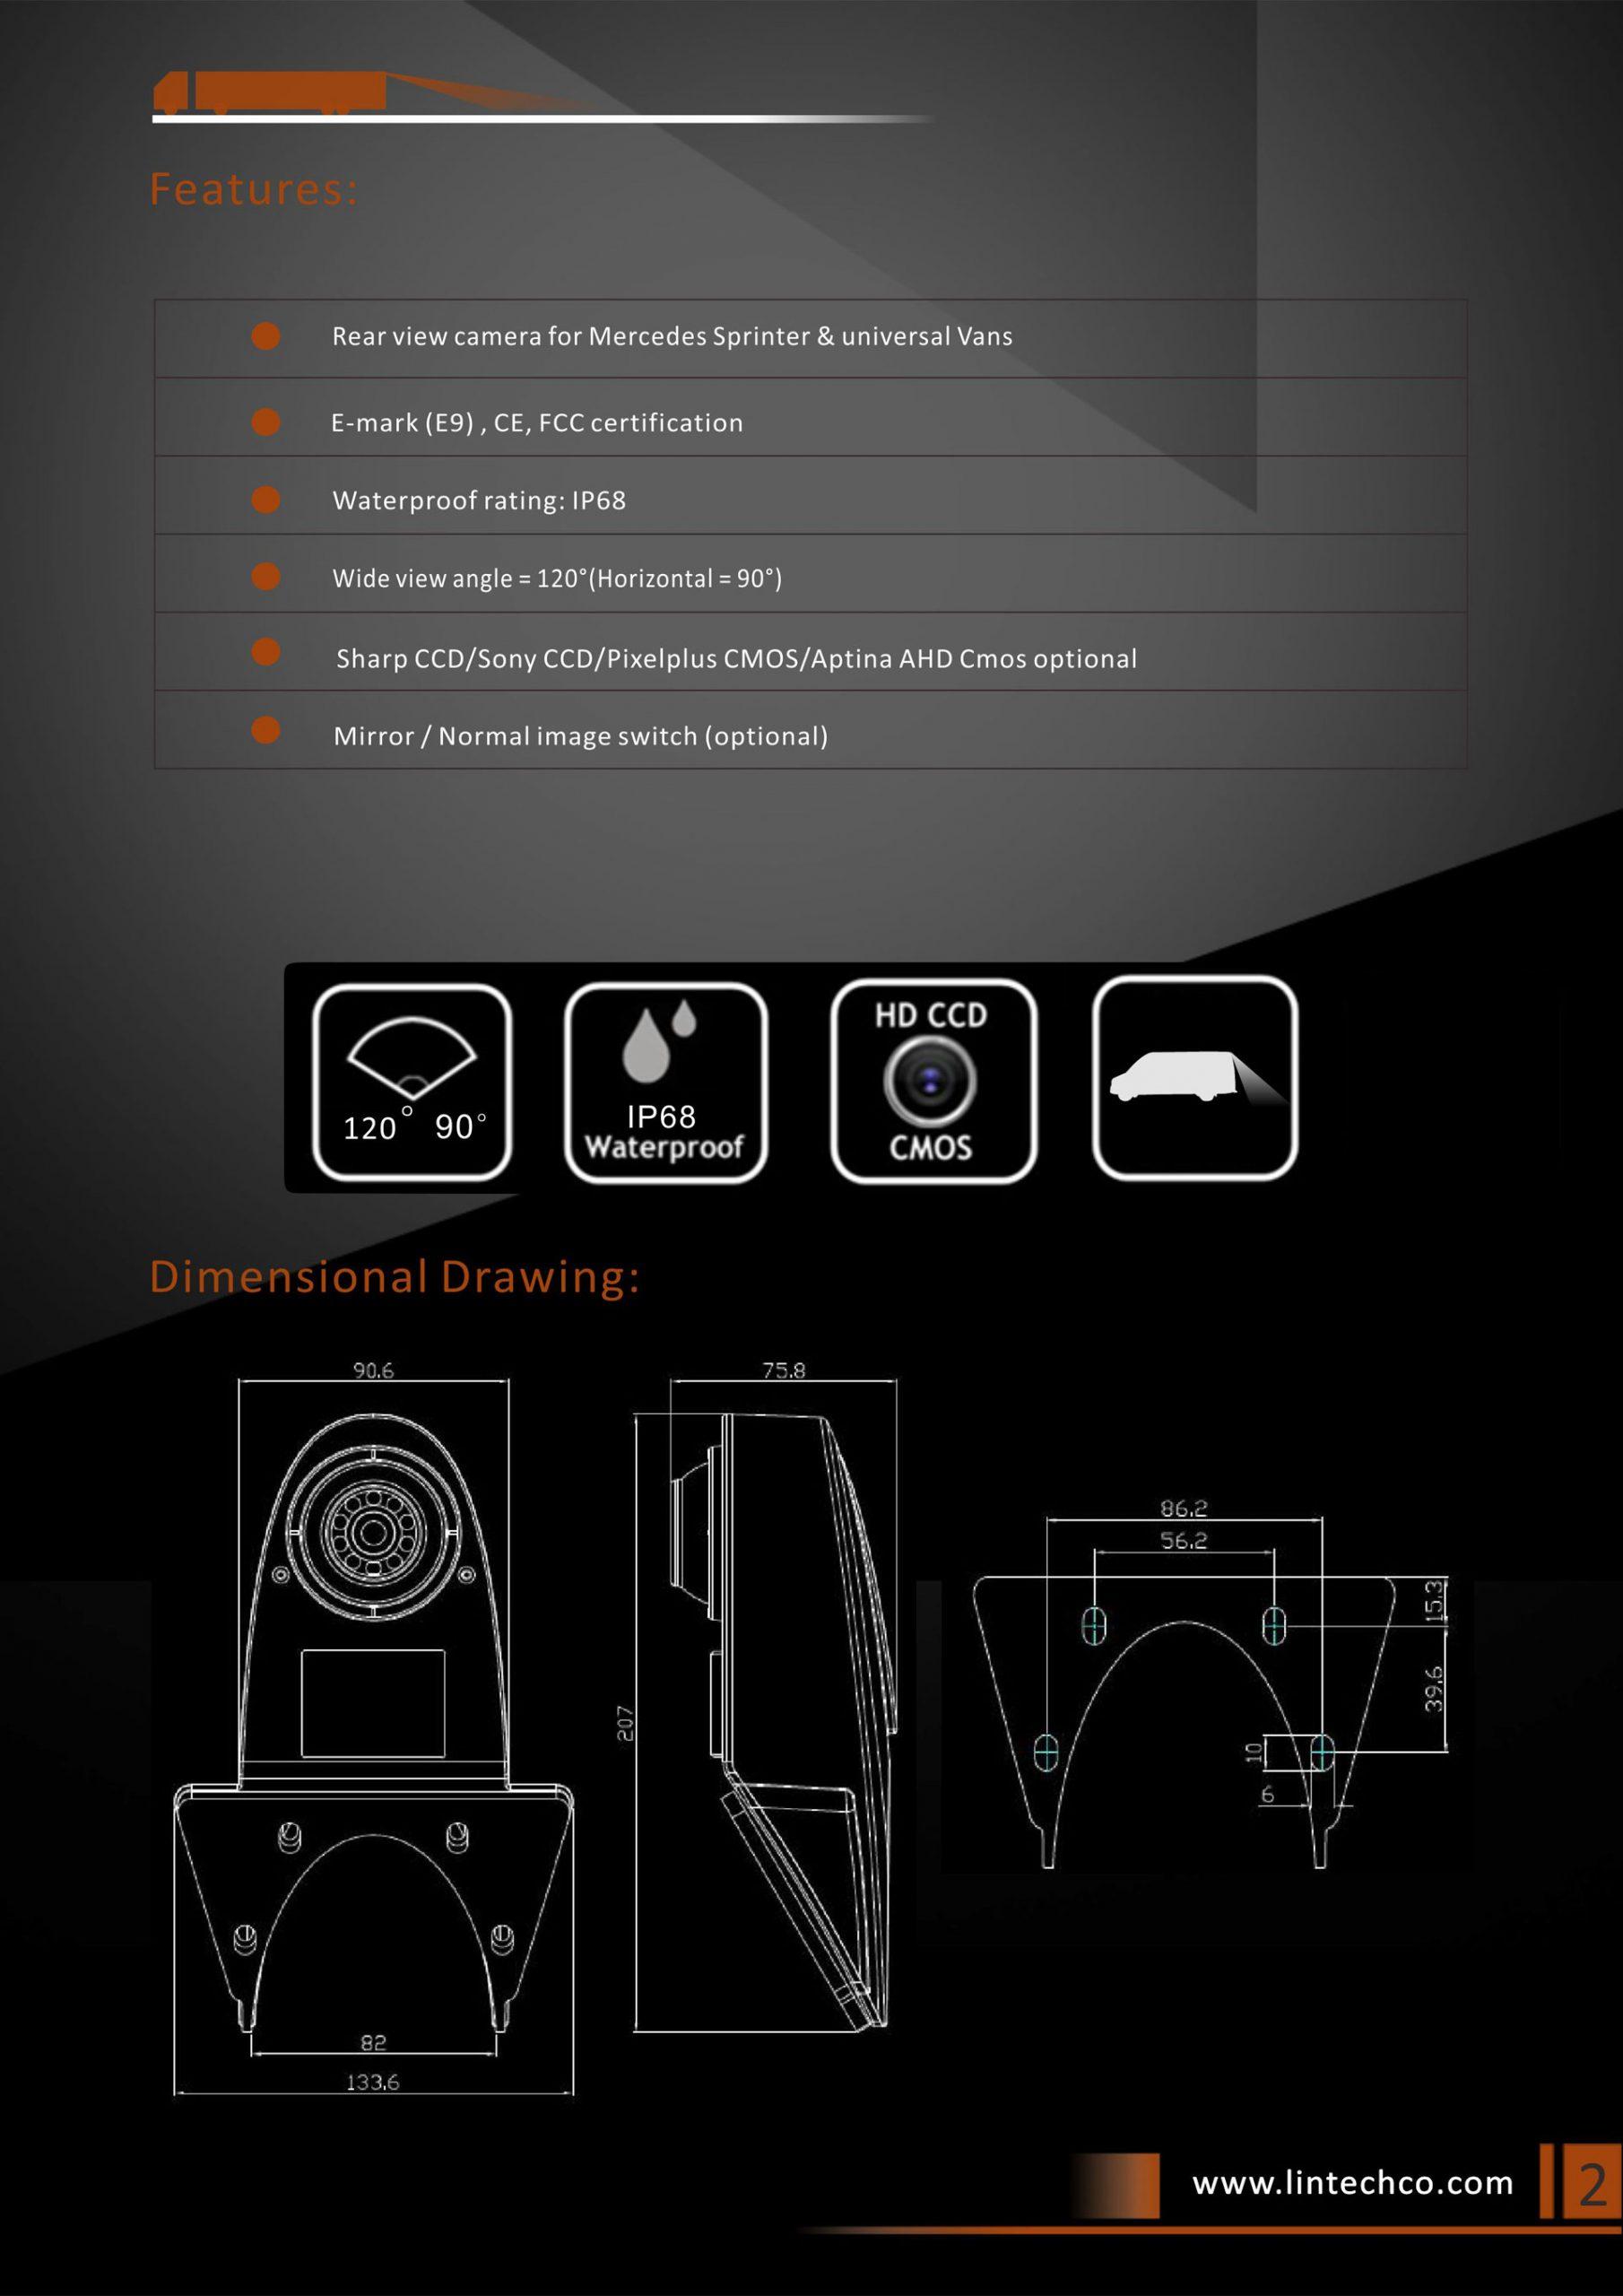 2.Rear View Camera For Mercedes Sprinter & Universal Vans